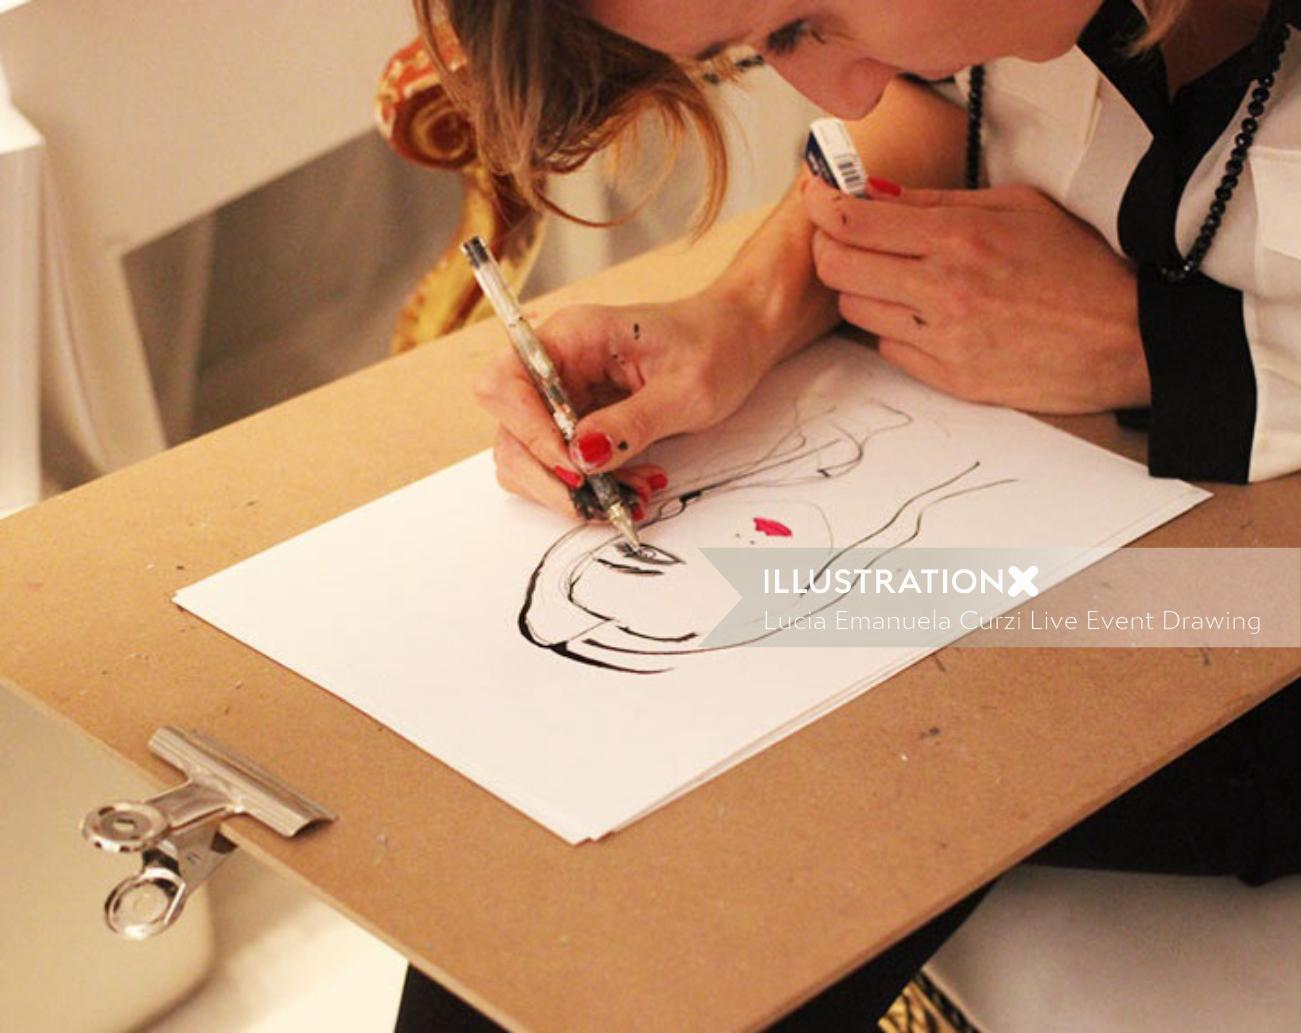 Live portrait drawing by Lucia Emanuela Curzi